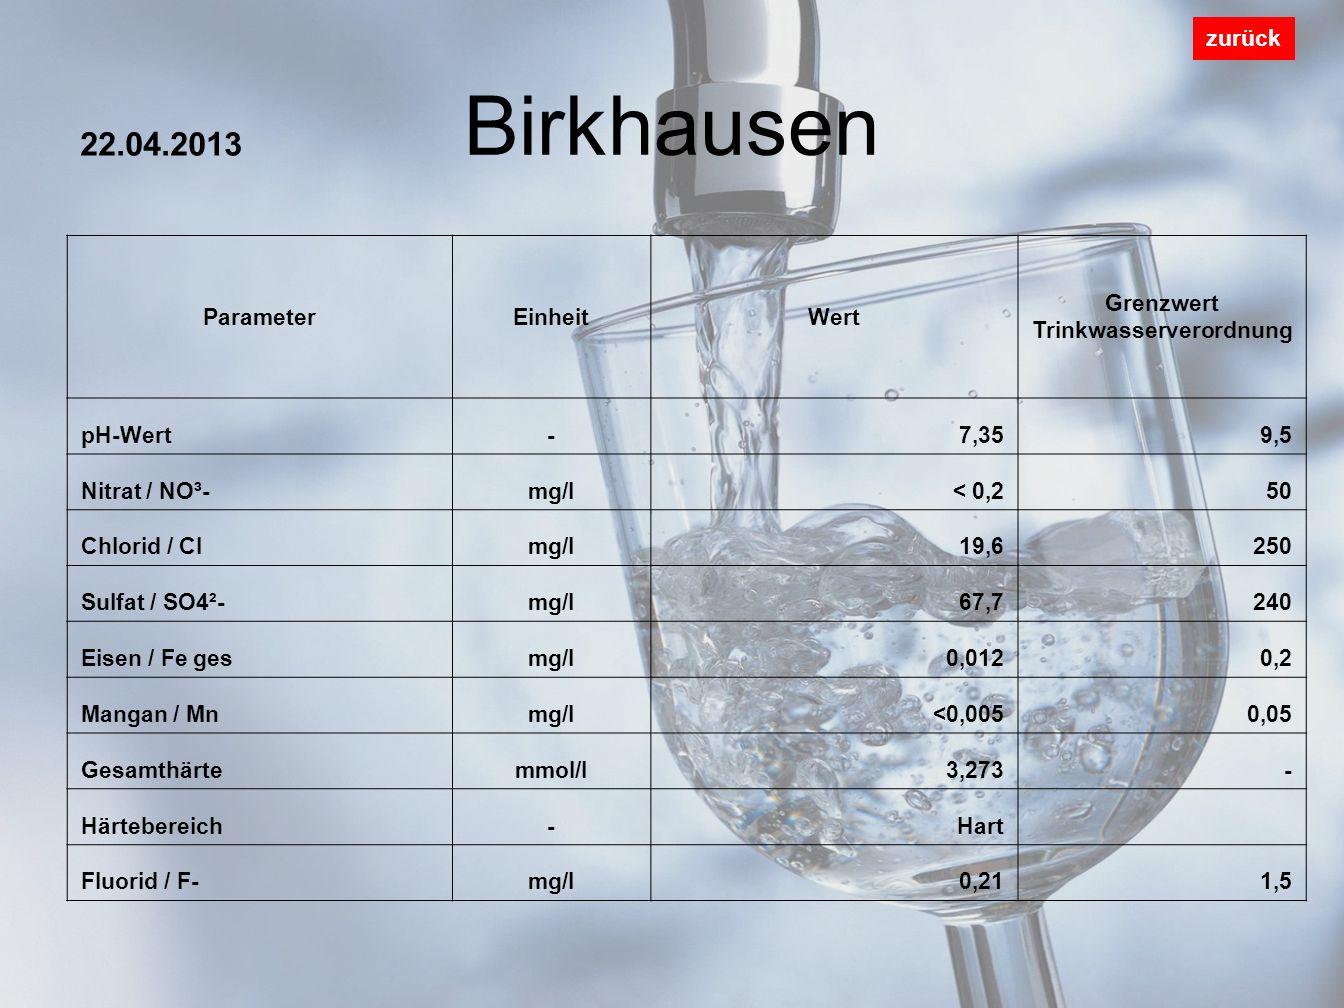 Gleina zurück ParameterEinheitWert Grenzwert Trinkwasserverordnung pH-Wert-7,339,5 Nitrat / NO³-mg/l34,250 Chlorid / Clmg/l39,4250 Sulfat / SO4²-mg/l88,9240 Eisen / Fe gesmg/l<0,0100,2 Mangan / Mnmg/l<0,0050,05 Gesamthärtemmol/l5,005- Härtebereich-Hart Fluorid / F-mg/l0,061,5 17.06.2013